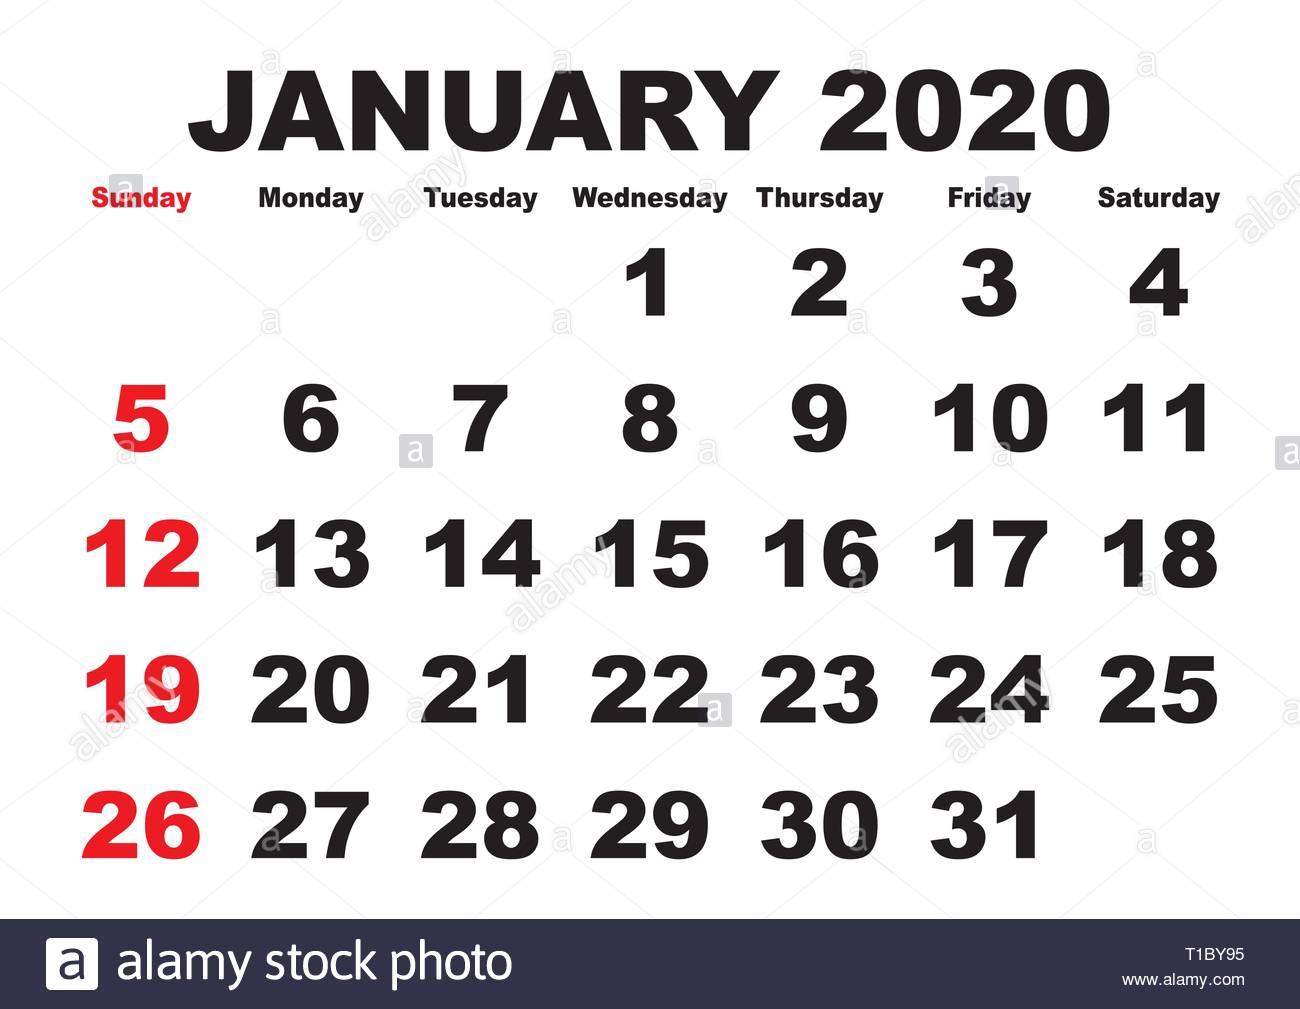 Printable Calendar January Weeks 2020 2020 calendar January month. Vector printable calendar. Monthly